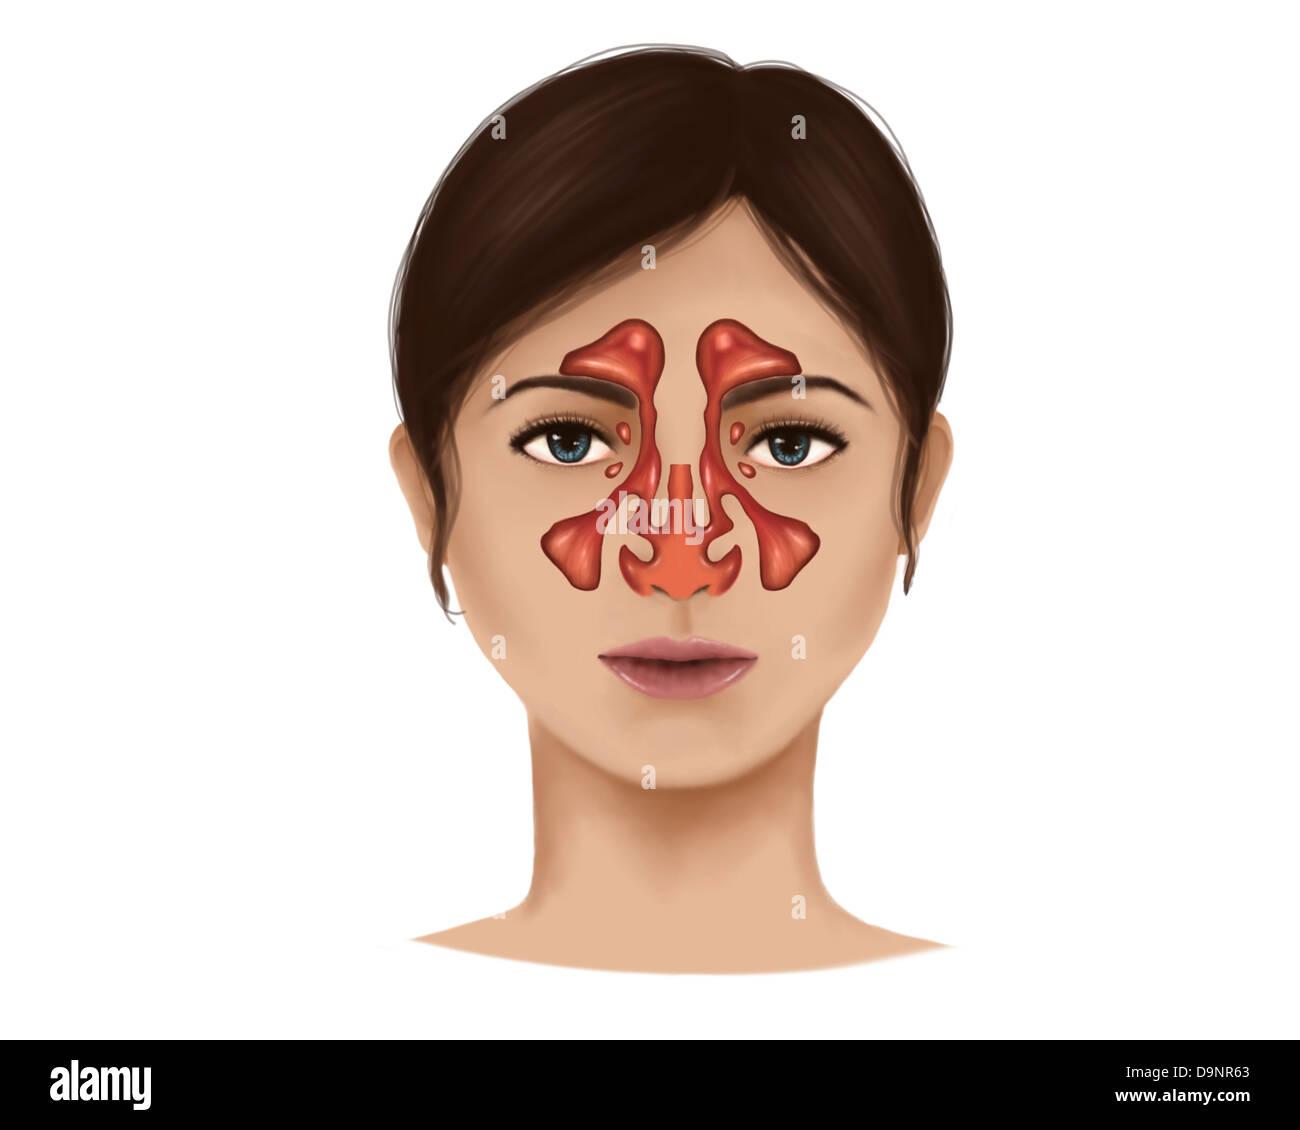 Anatomy of nasal sinuses Stock Photo: 57642203 - Alamy